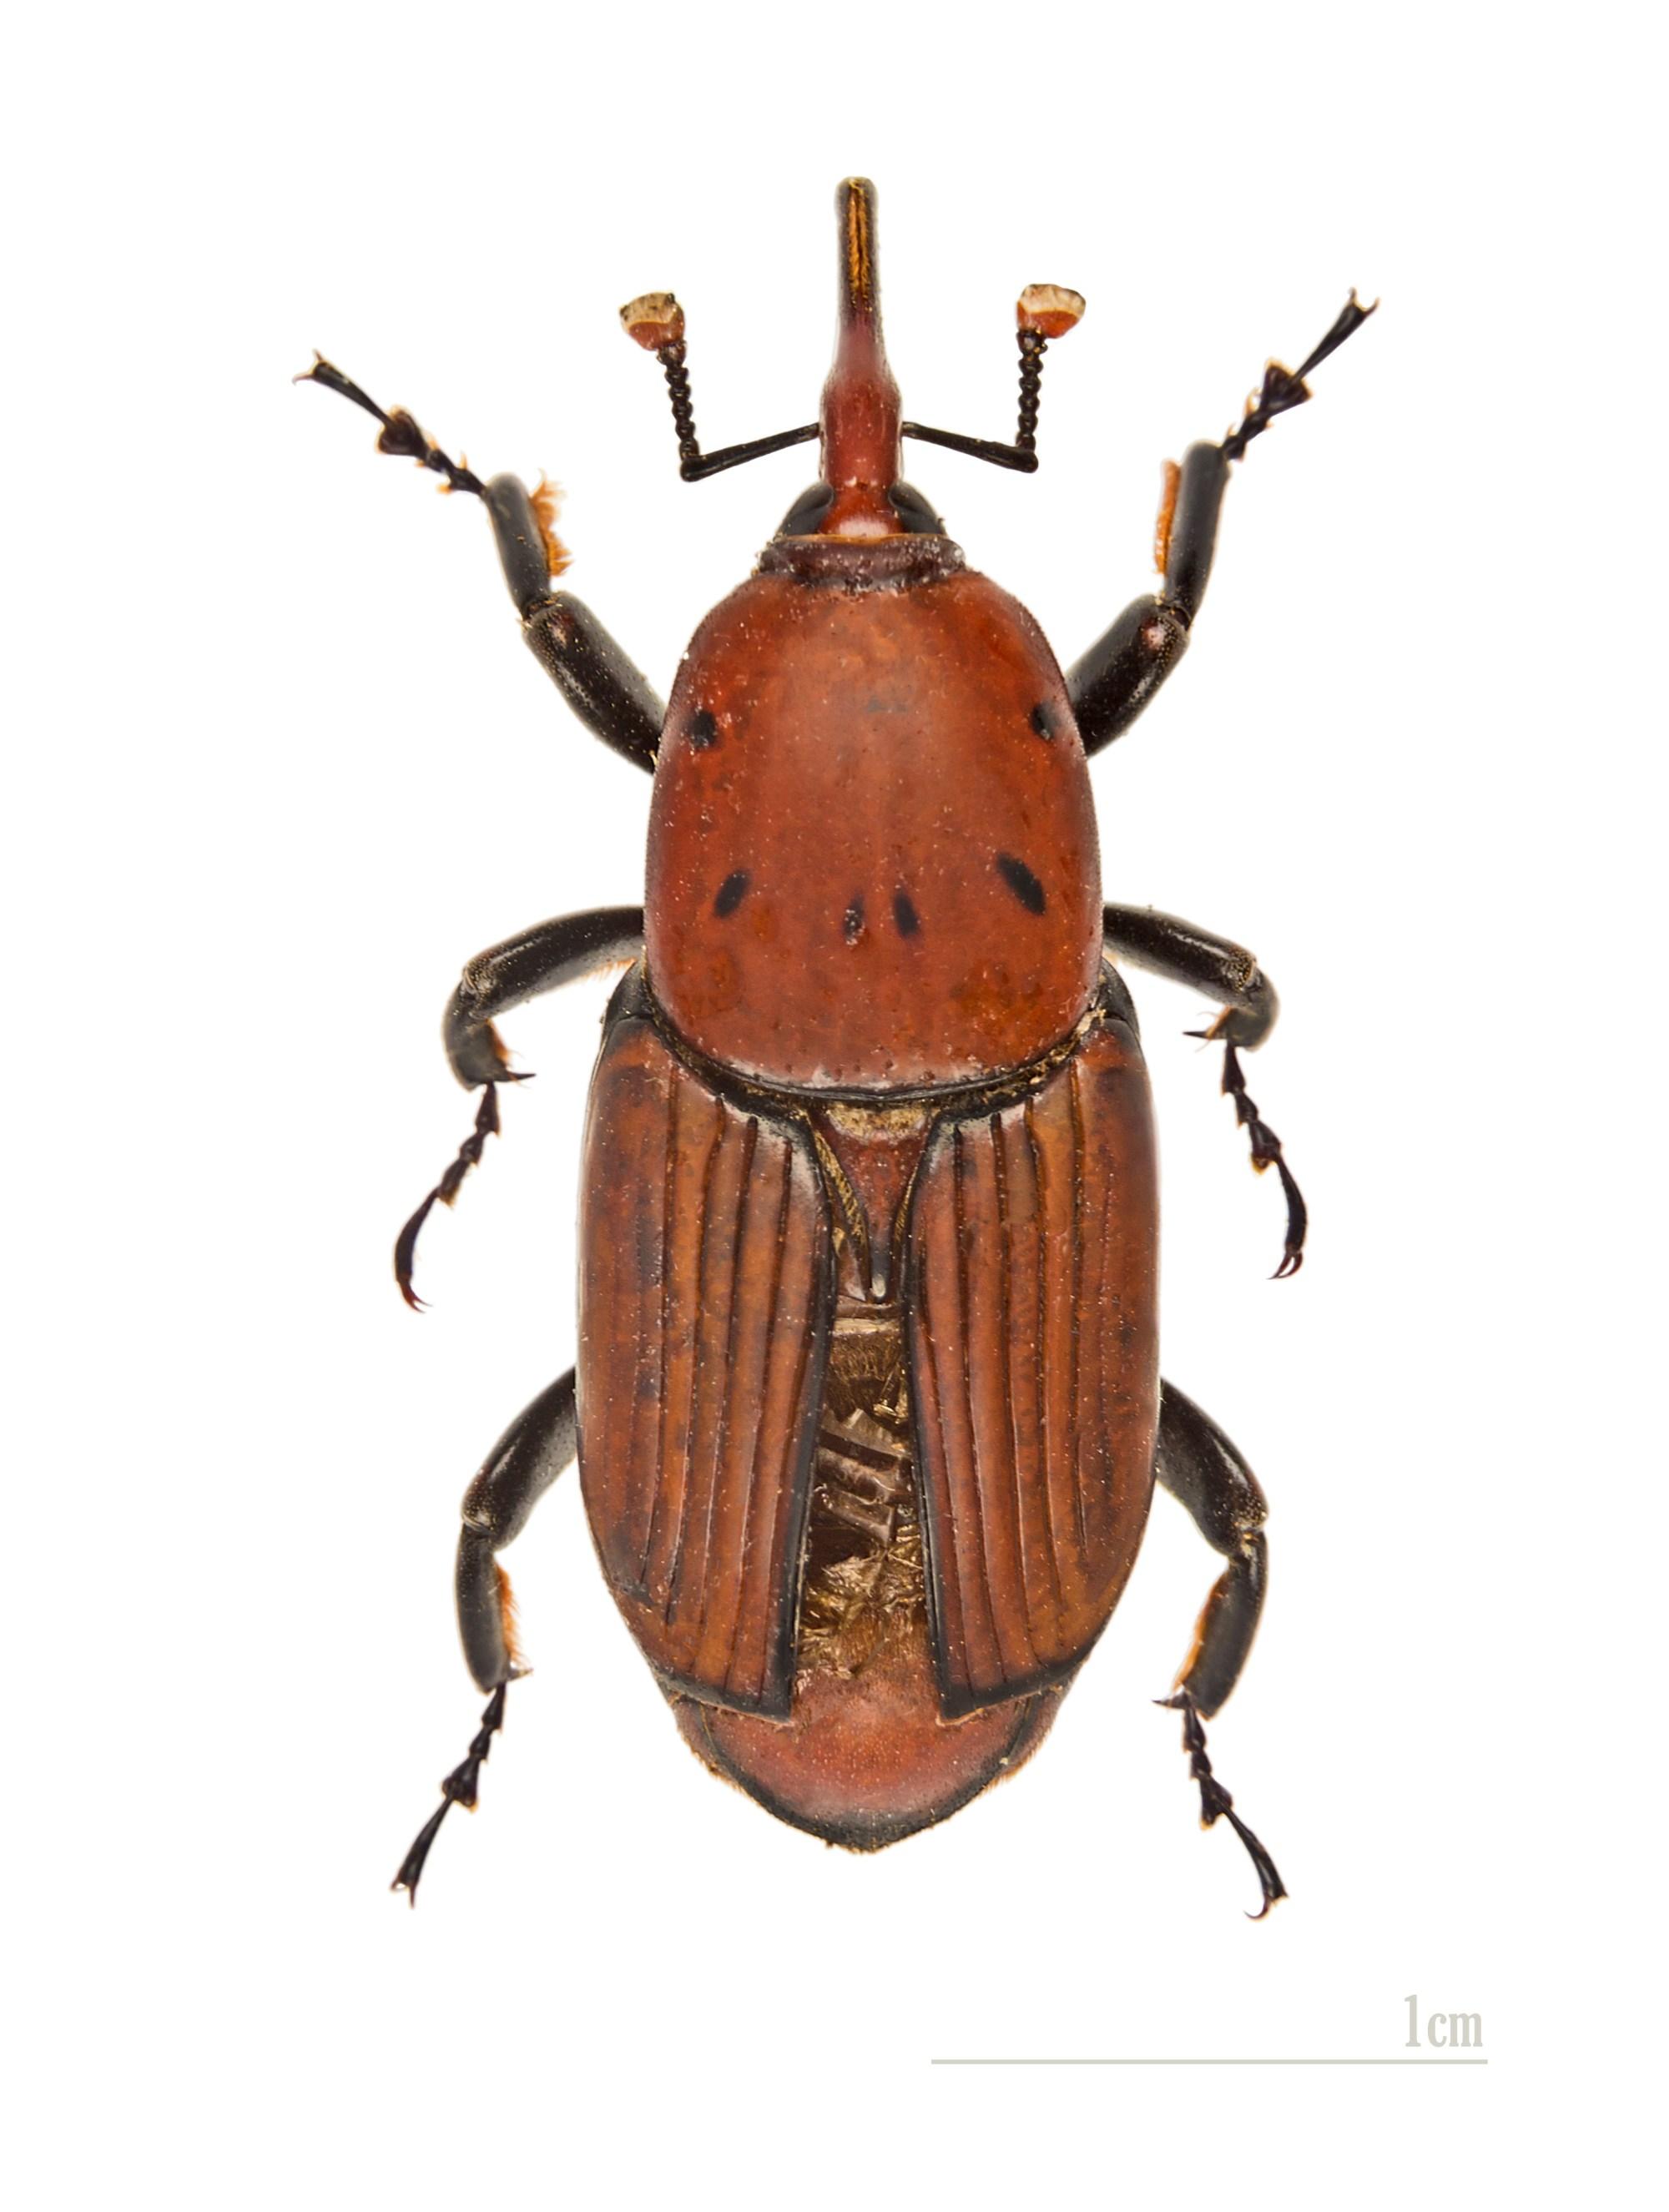 hight resolution of rhynchophorus ferrugineus